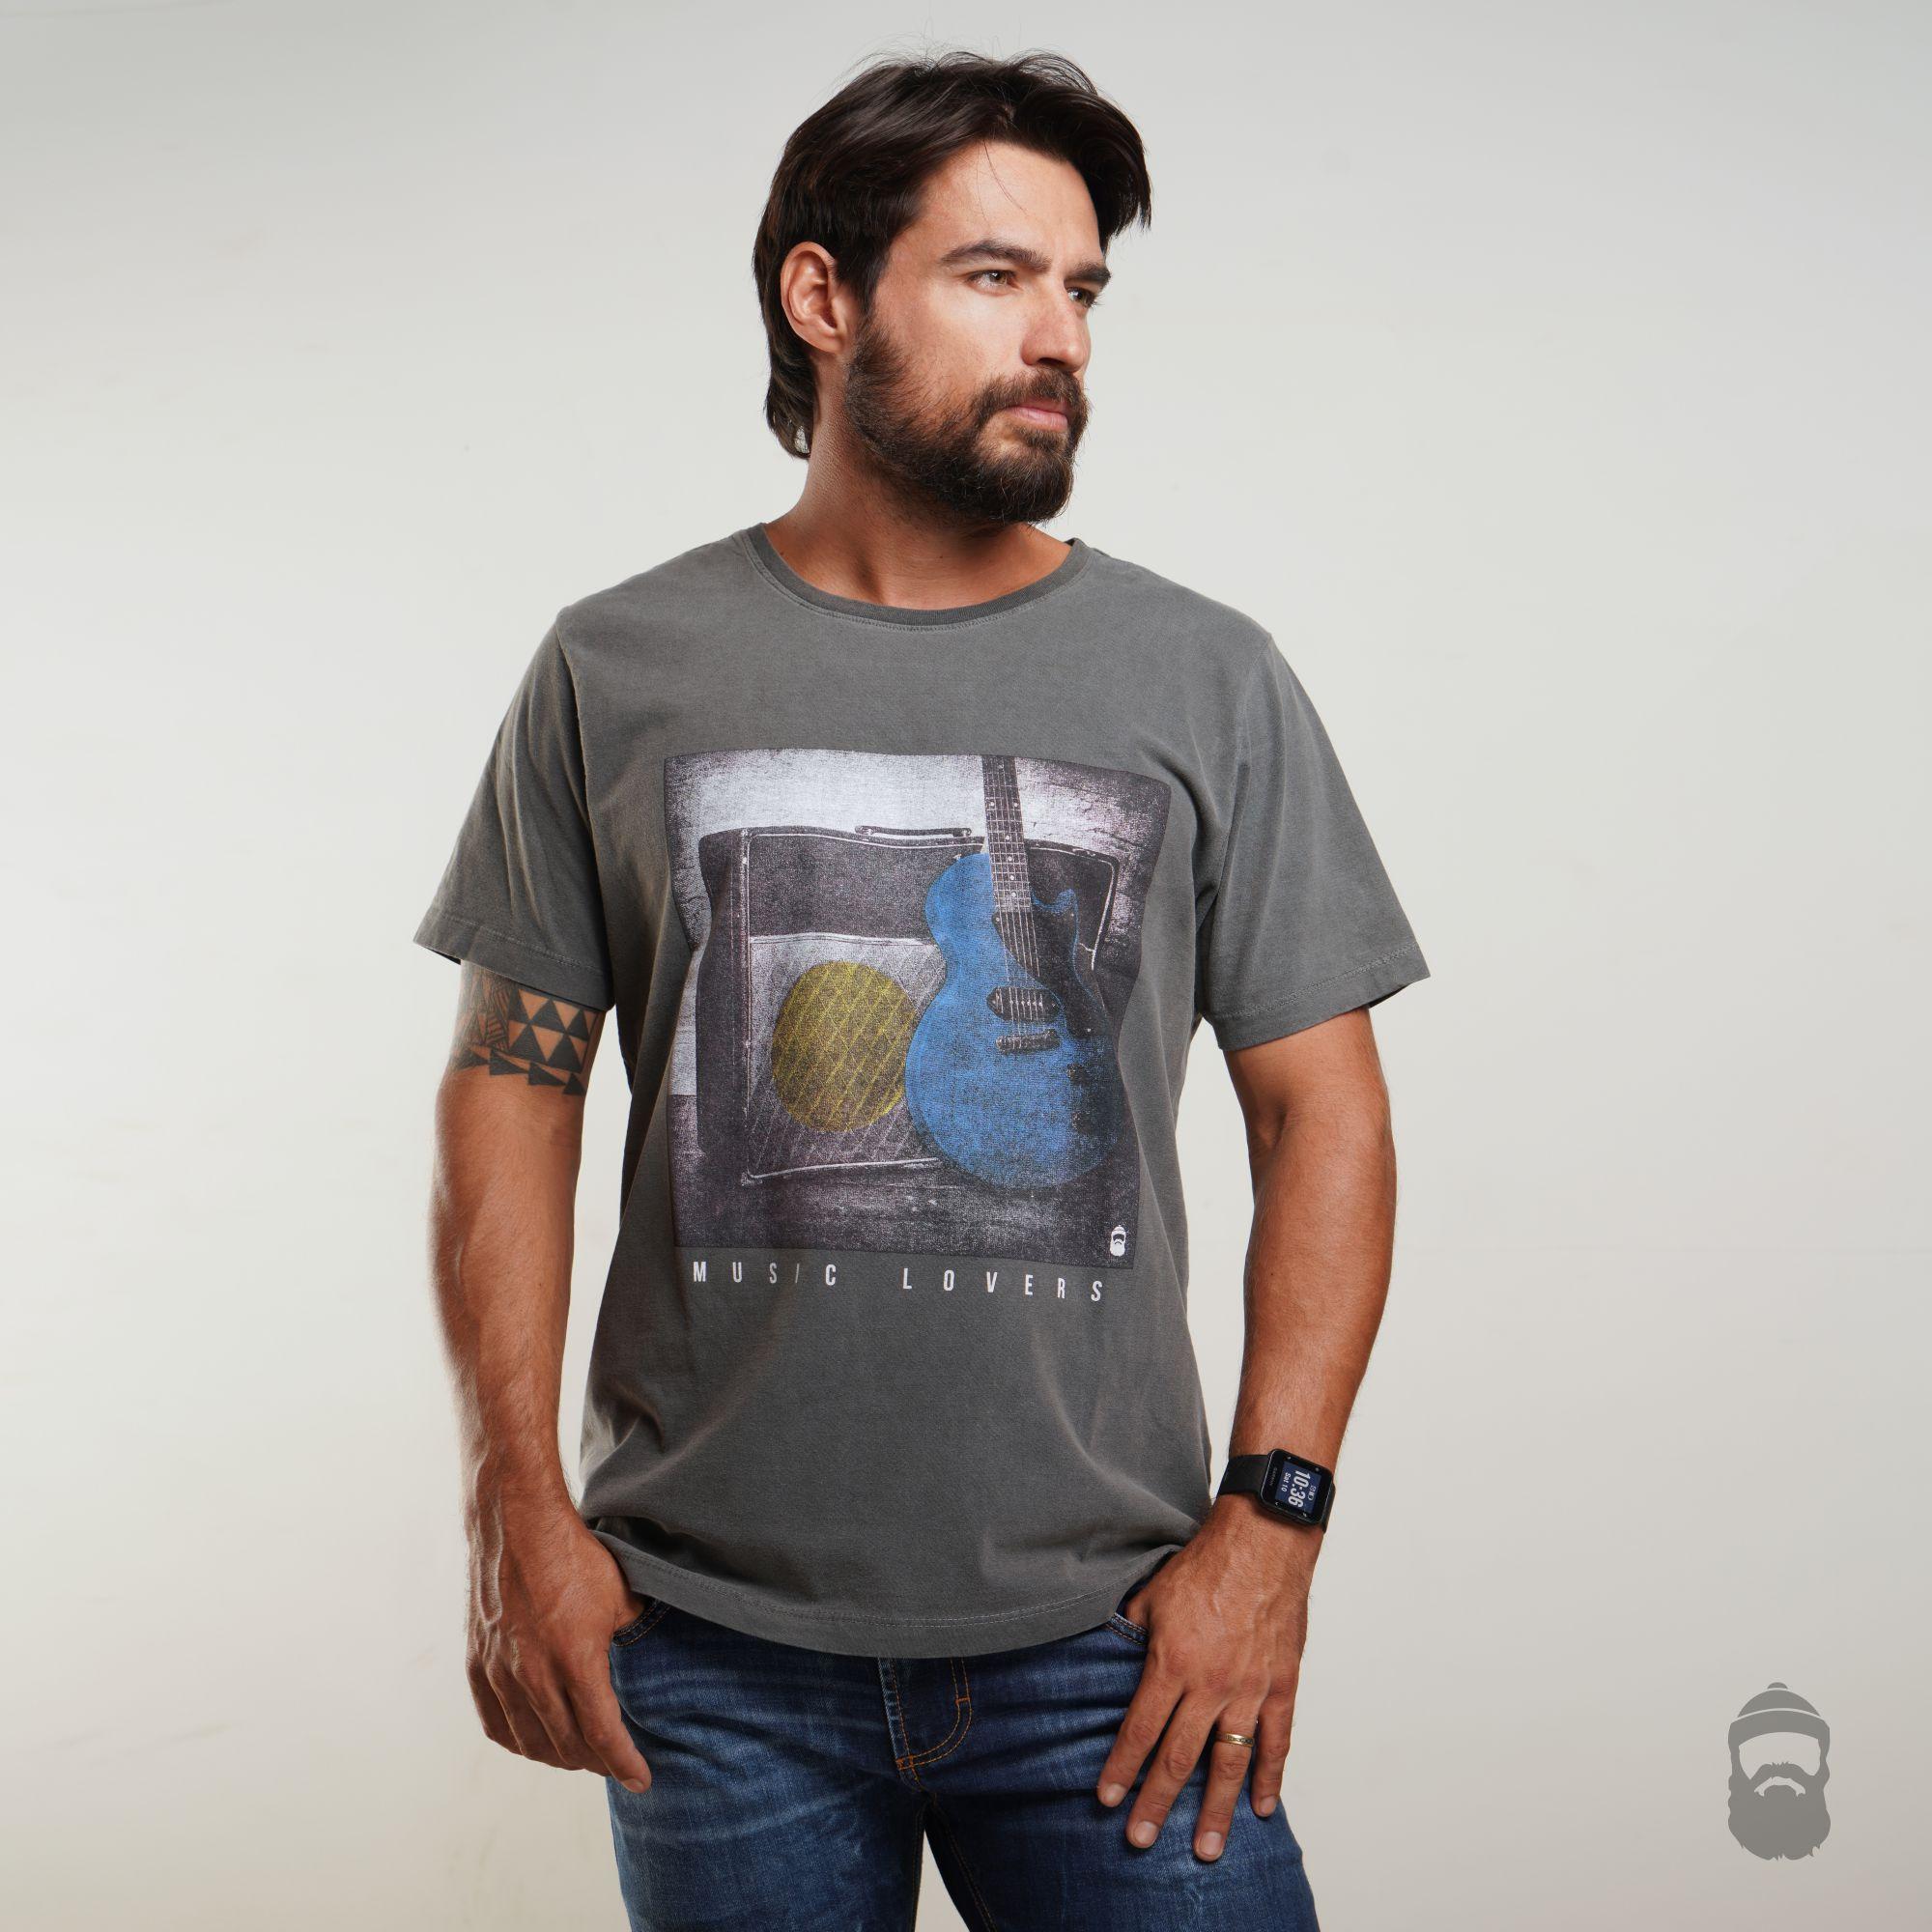 O Lenhador Camiseta Music Lovers Estonada Cinza